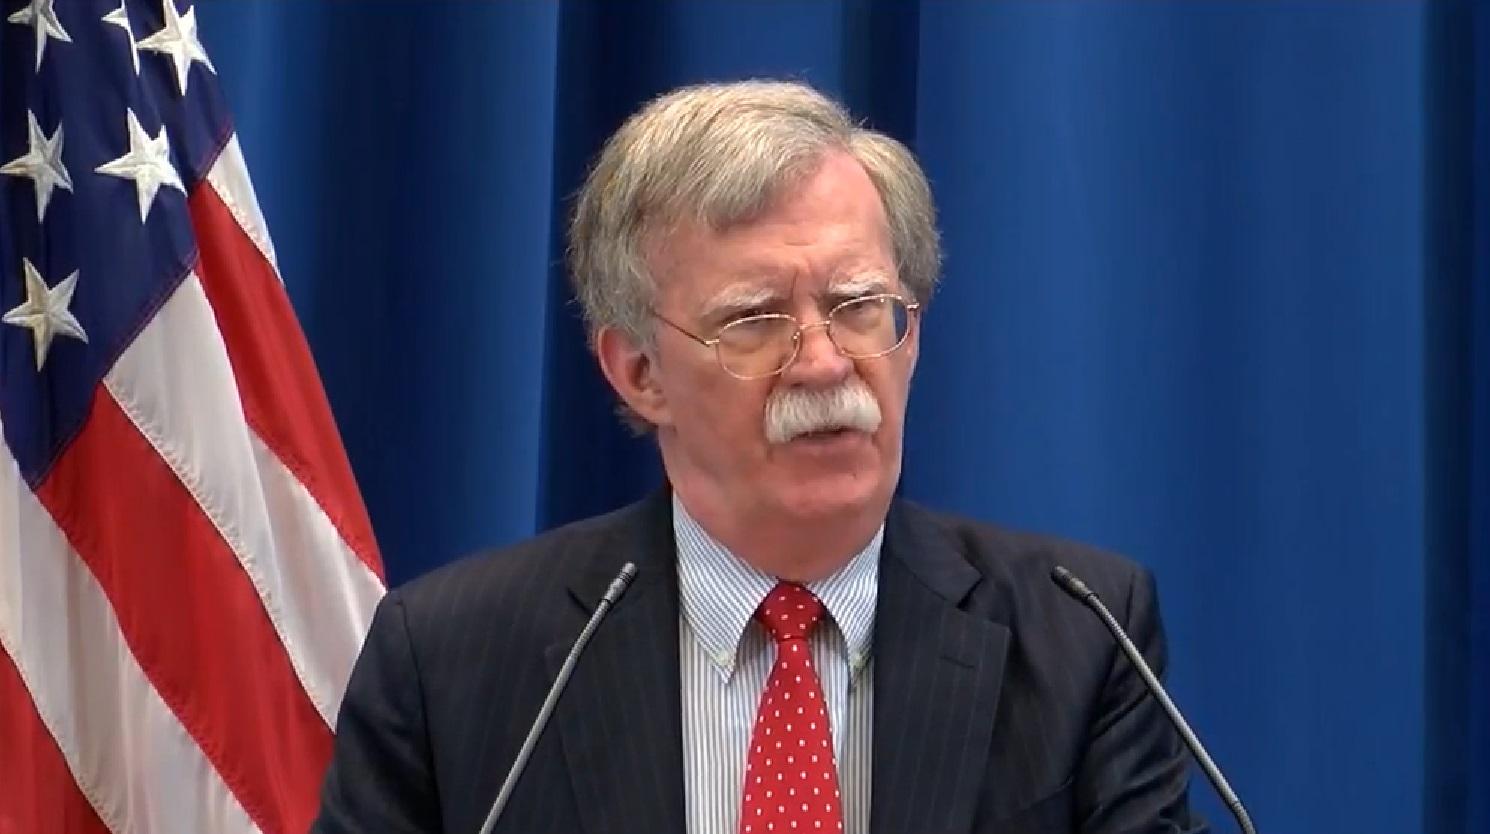 U.S. National Security Advisor Met With His Russian Counterpart In Geneva